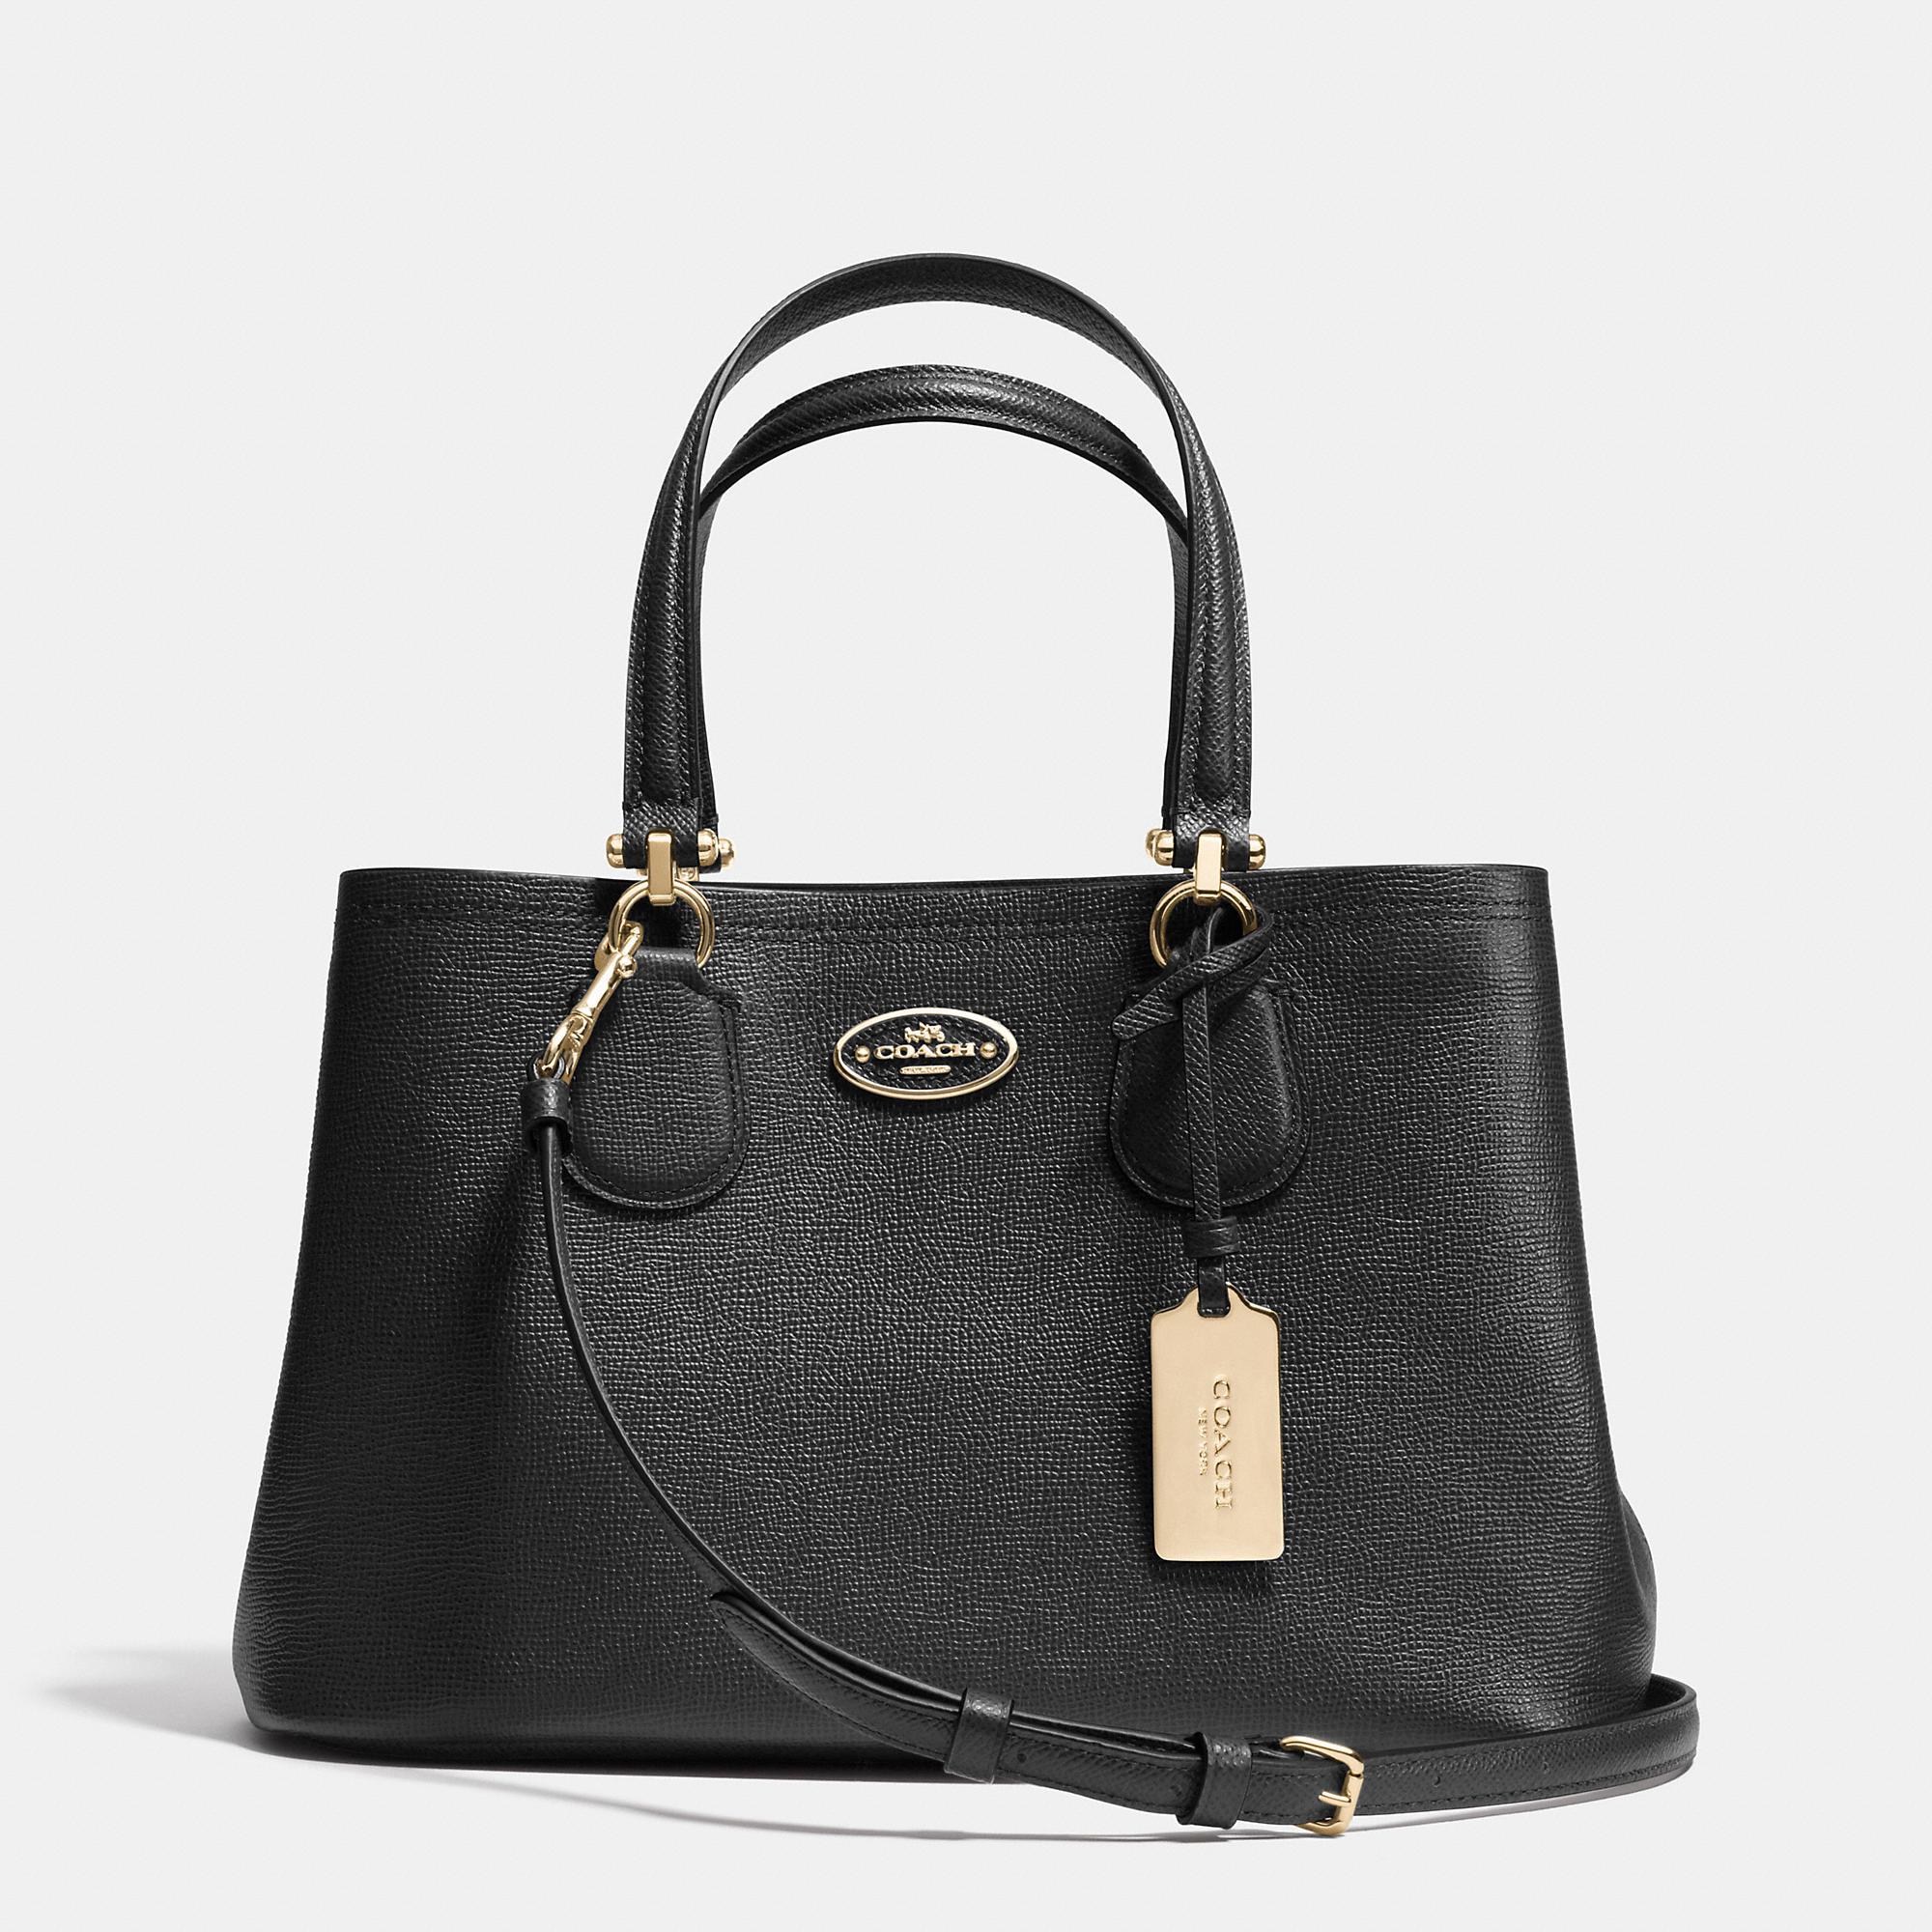 Bolsa Michael Kors Azul Marino : Coach small kitt carryall in crossgrain leather black